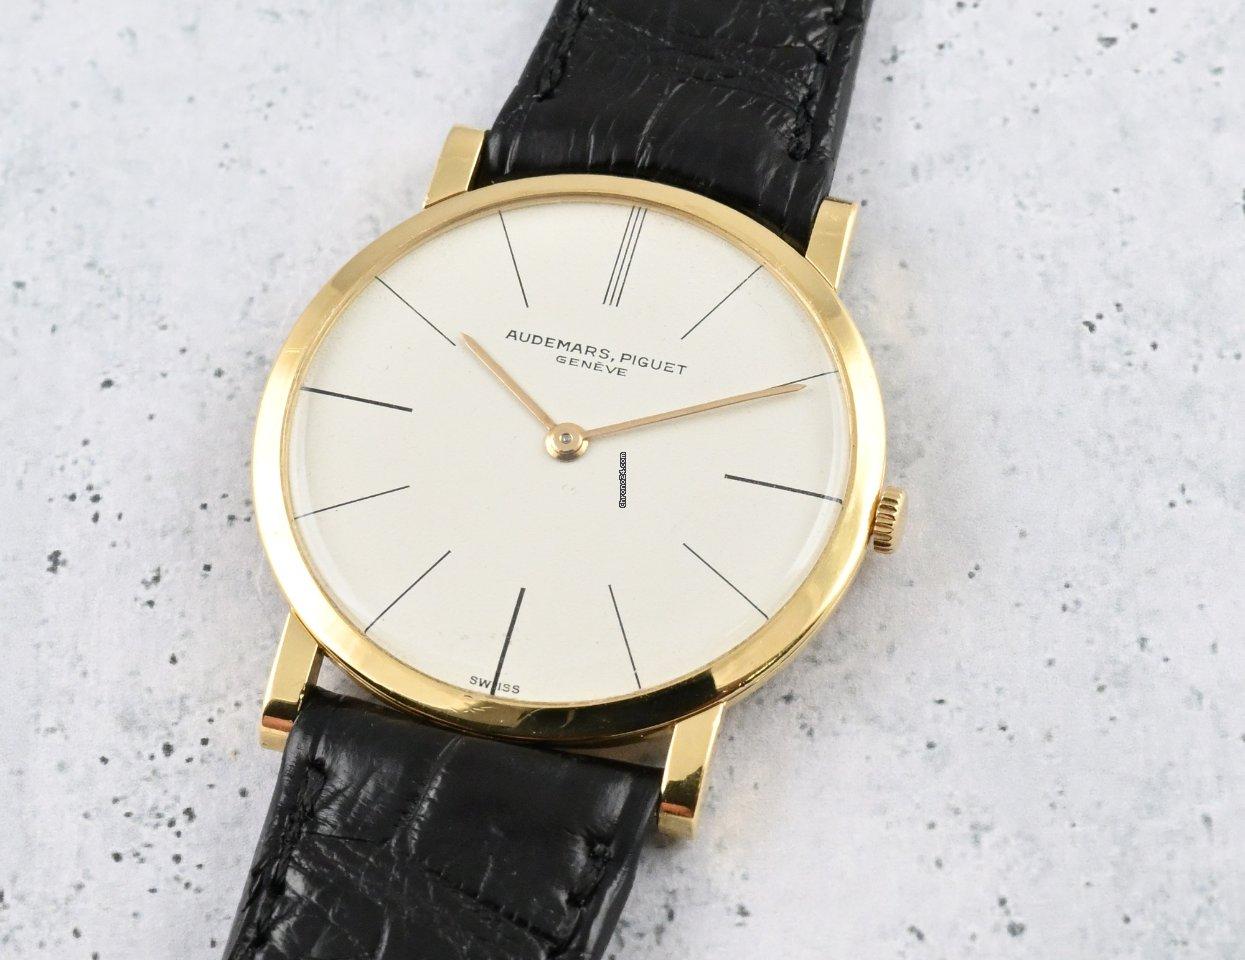 low priced b8188 5190b オーデマピゲ 腕時計の価格一覧 | Chrono24